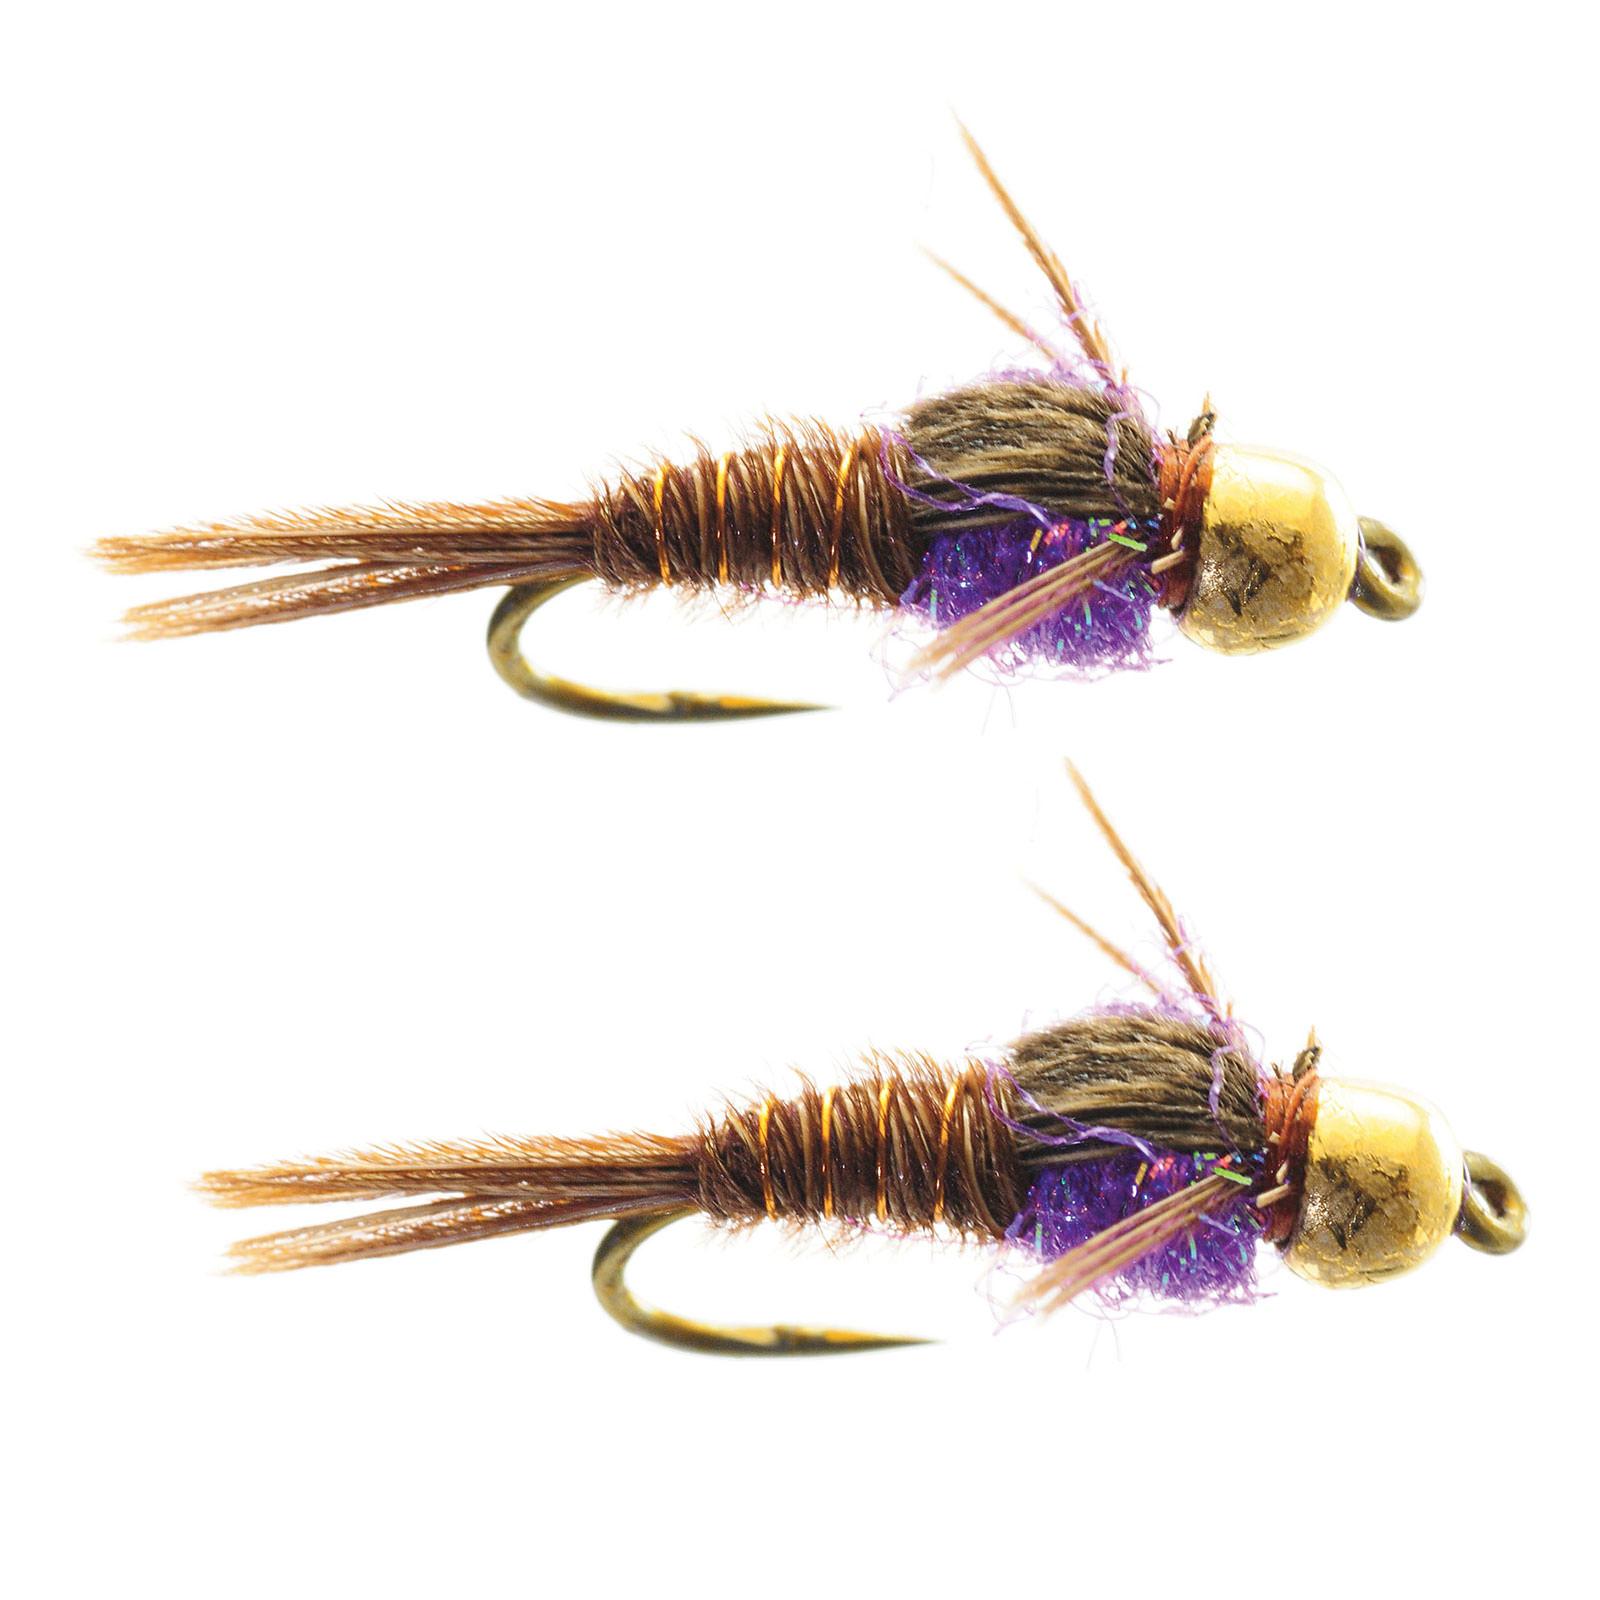 Size 16 Qty 12 Pheasant Tail Tungsten Umpqua